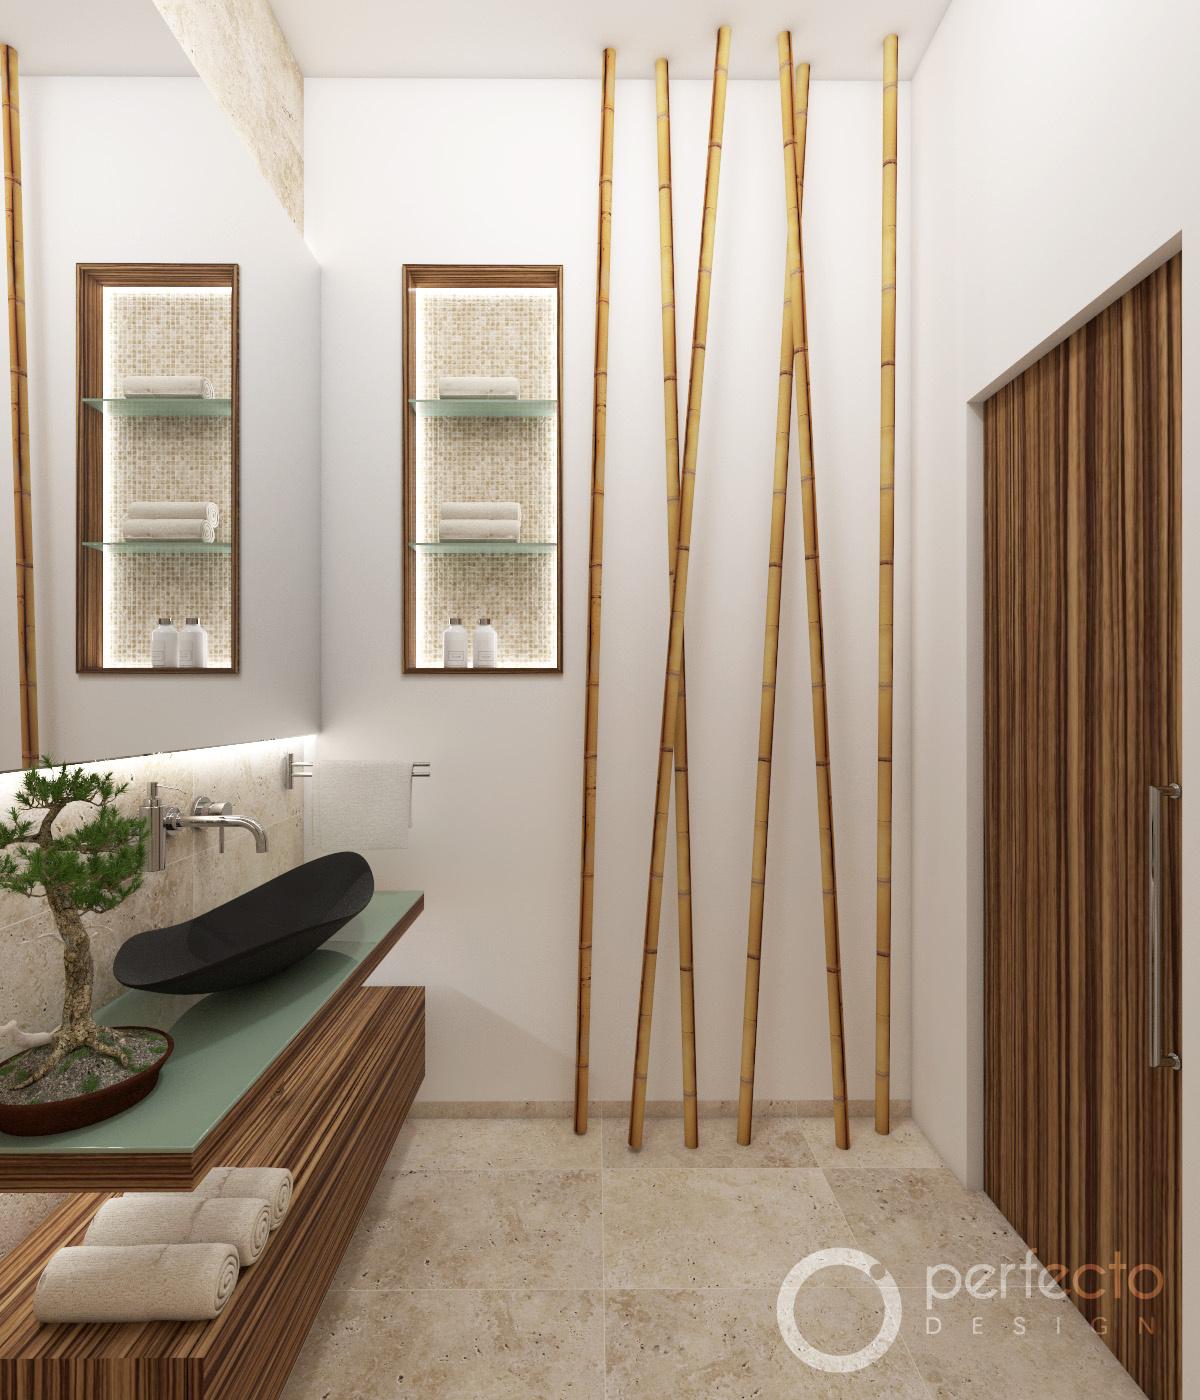 natur-badezimmer fuji | perfecto design, Badezimmer